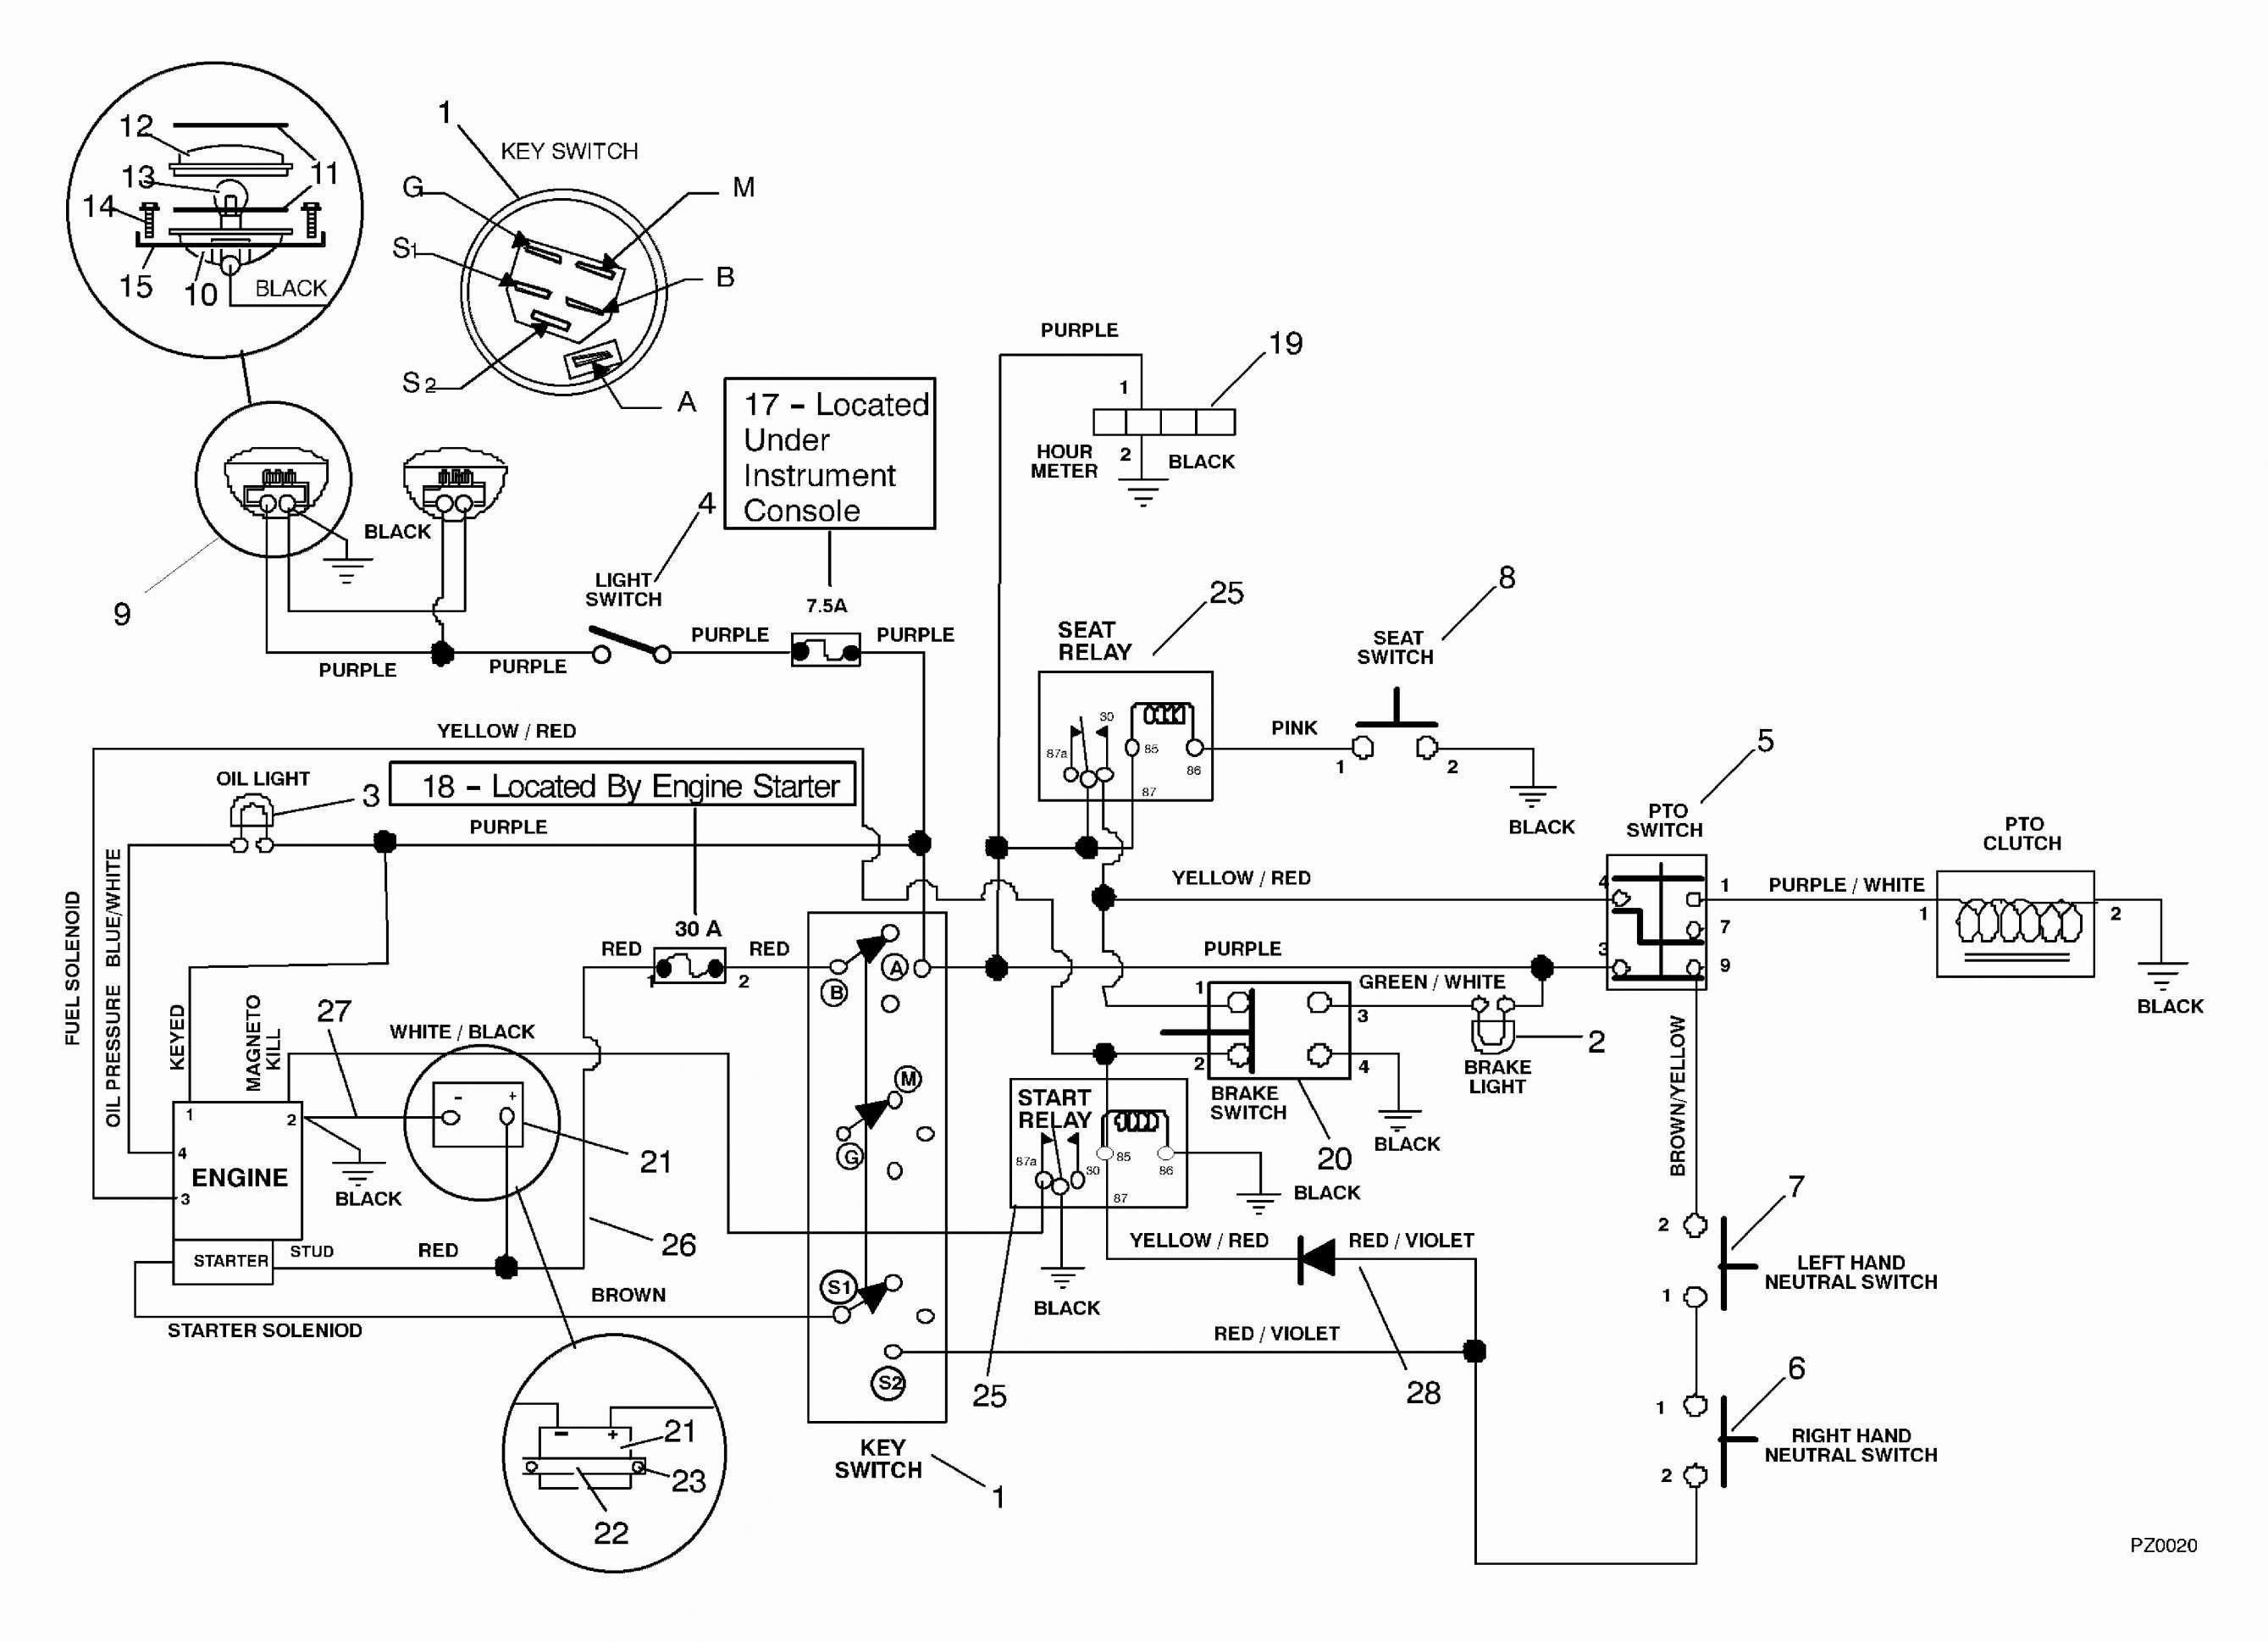 15 Wiring Diagram For Lawn Mower Kohler Engine Engine Diagram Wiringg Net Diagram Kohler Engines Engineering